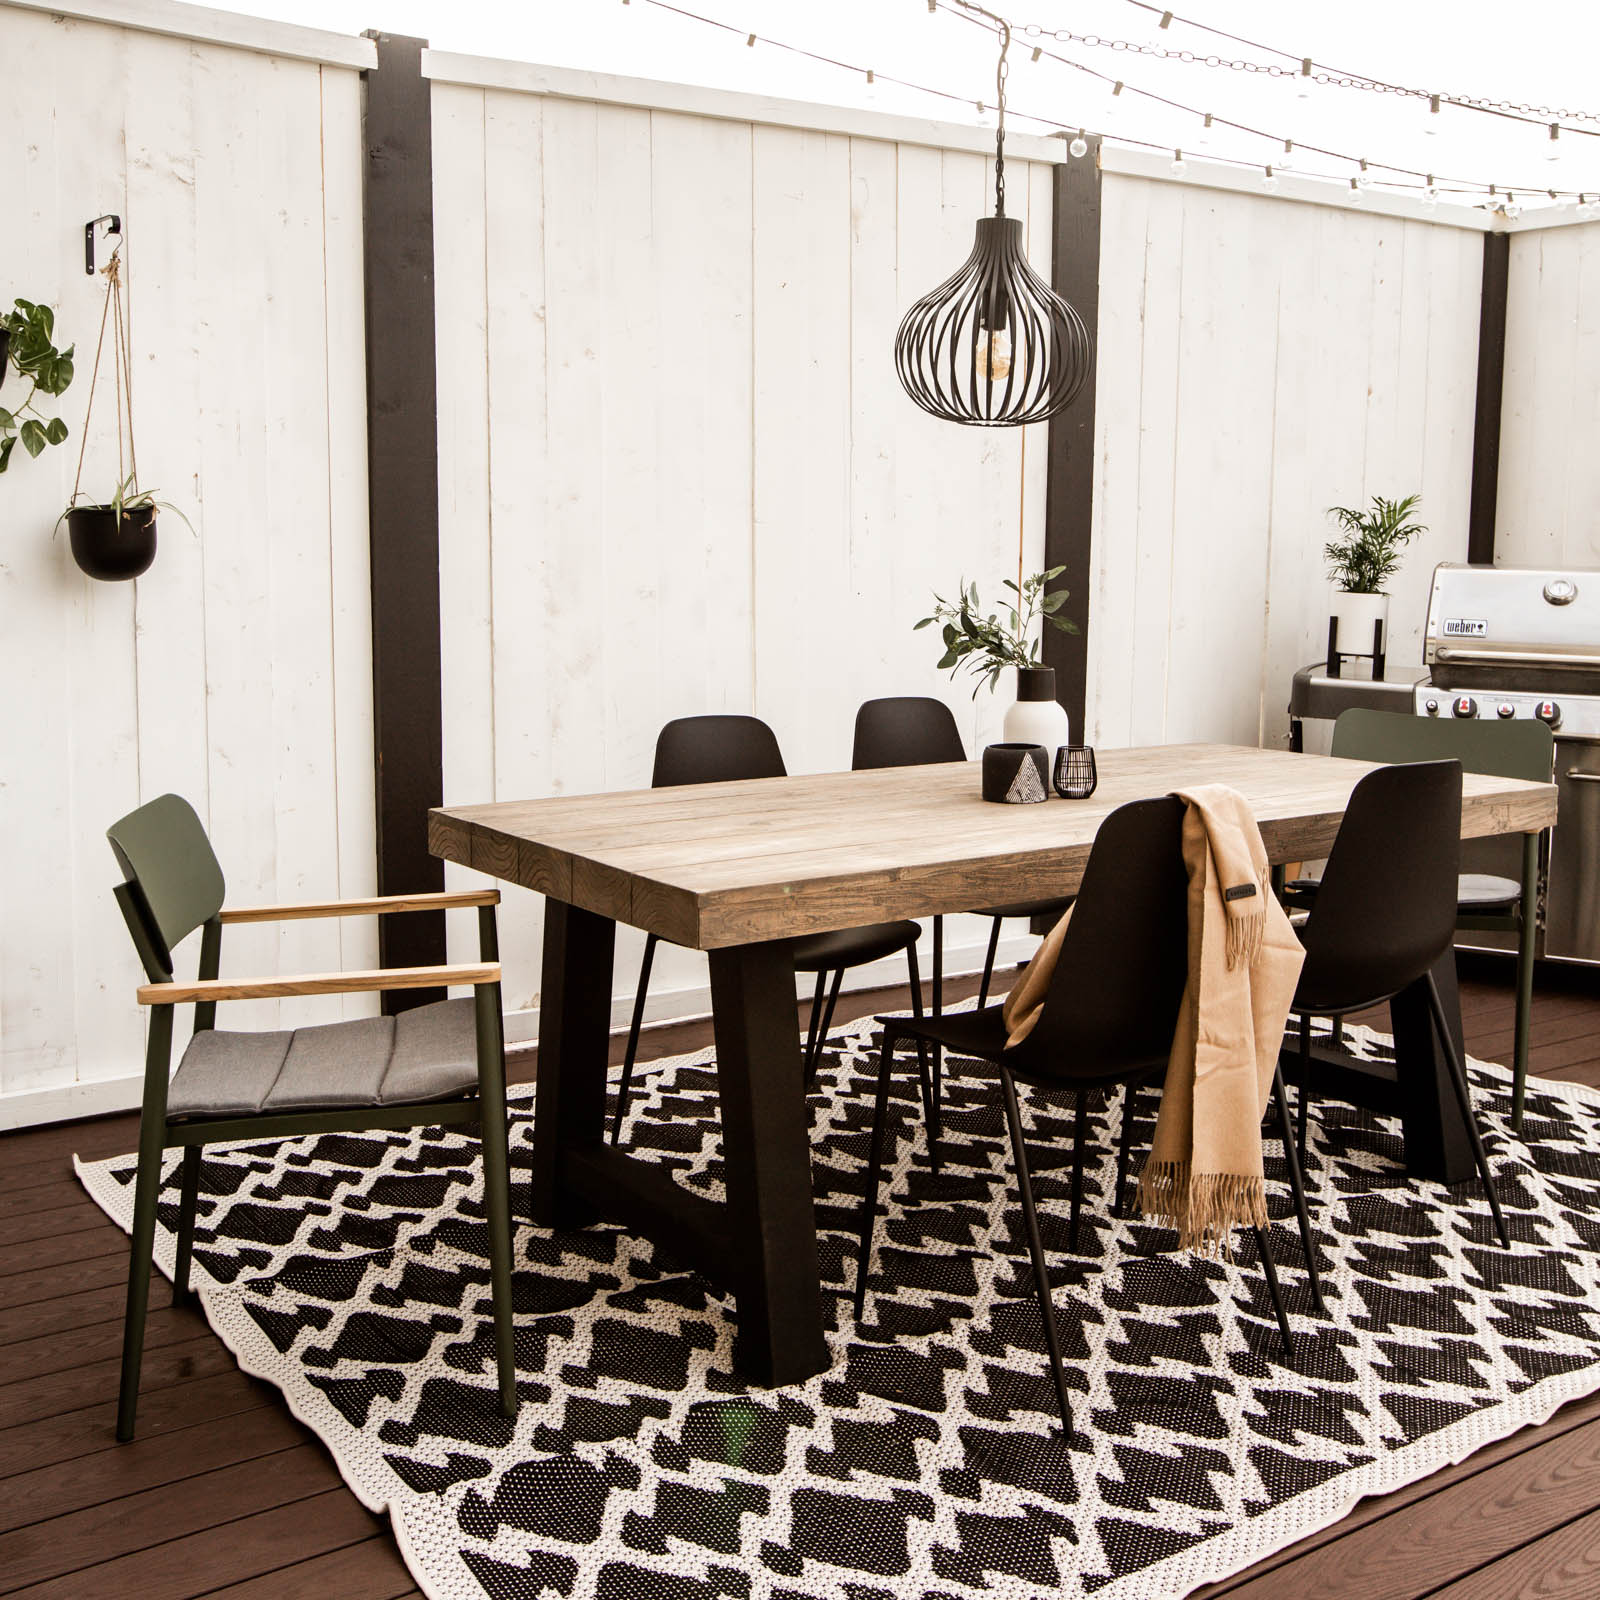 5 Tips For Choosing Modern Patio Furniture